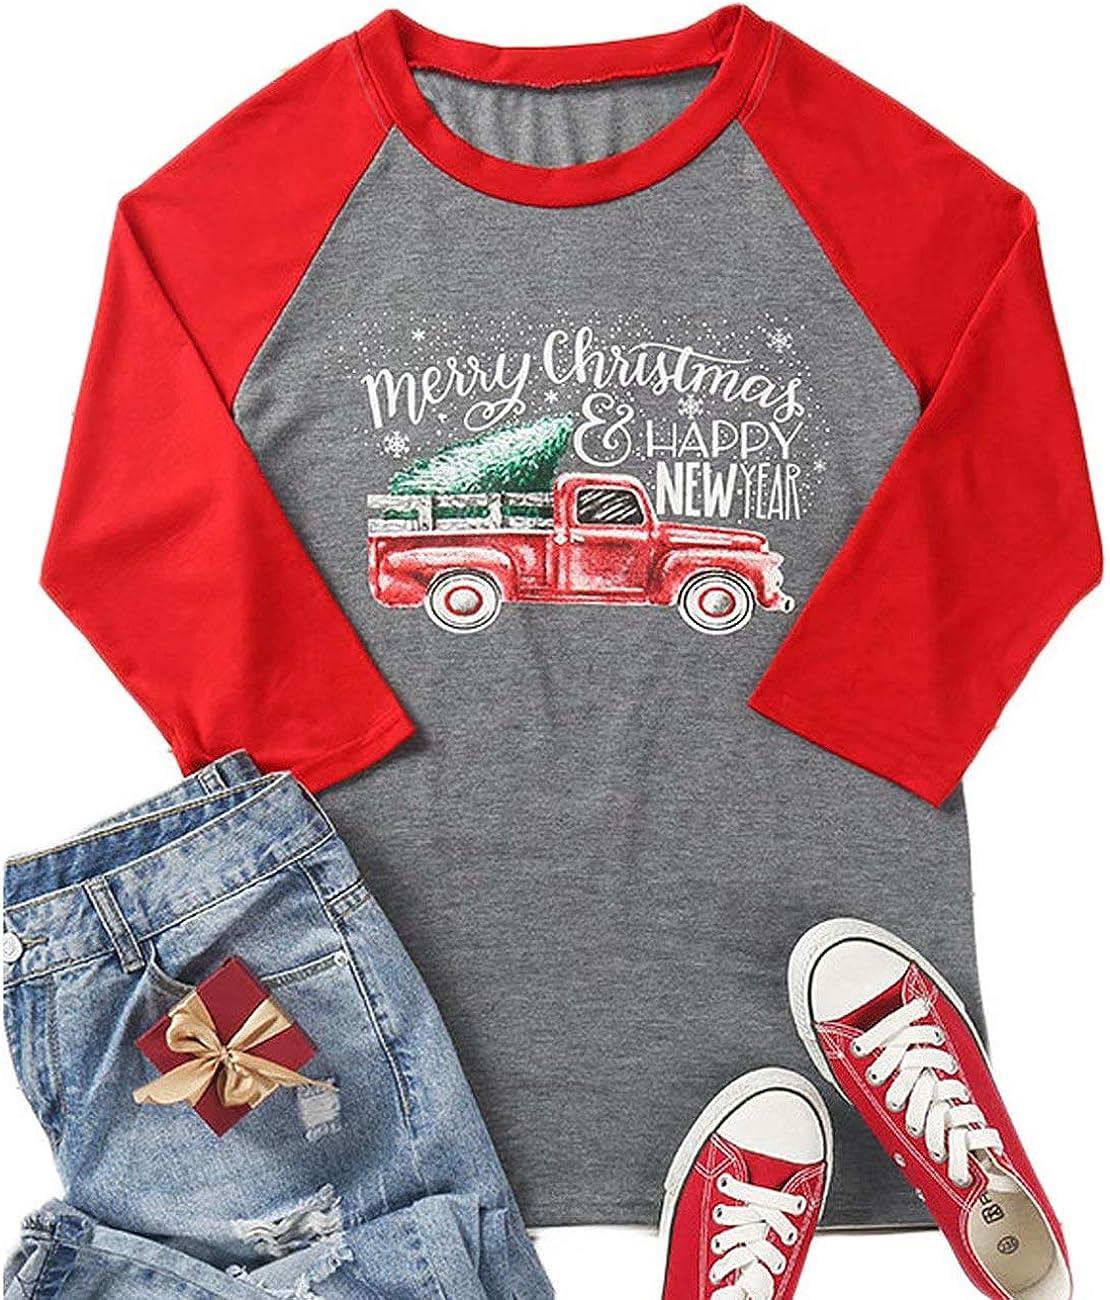 Merry Christmas and Happy New Year T Shirts Women Christmas Tree Truck 3/4 Sleeve Splicing Baseball Tee Tops